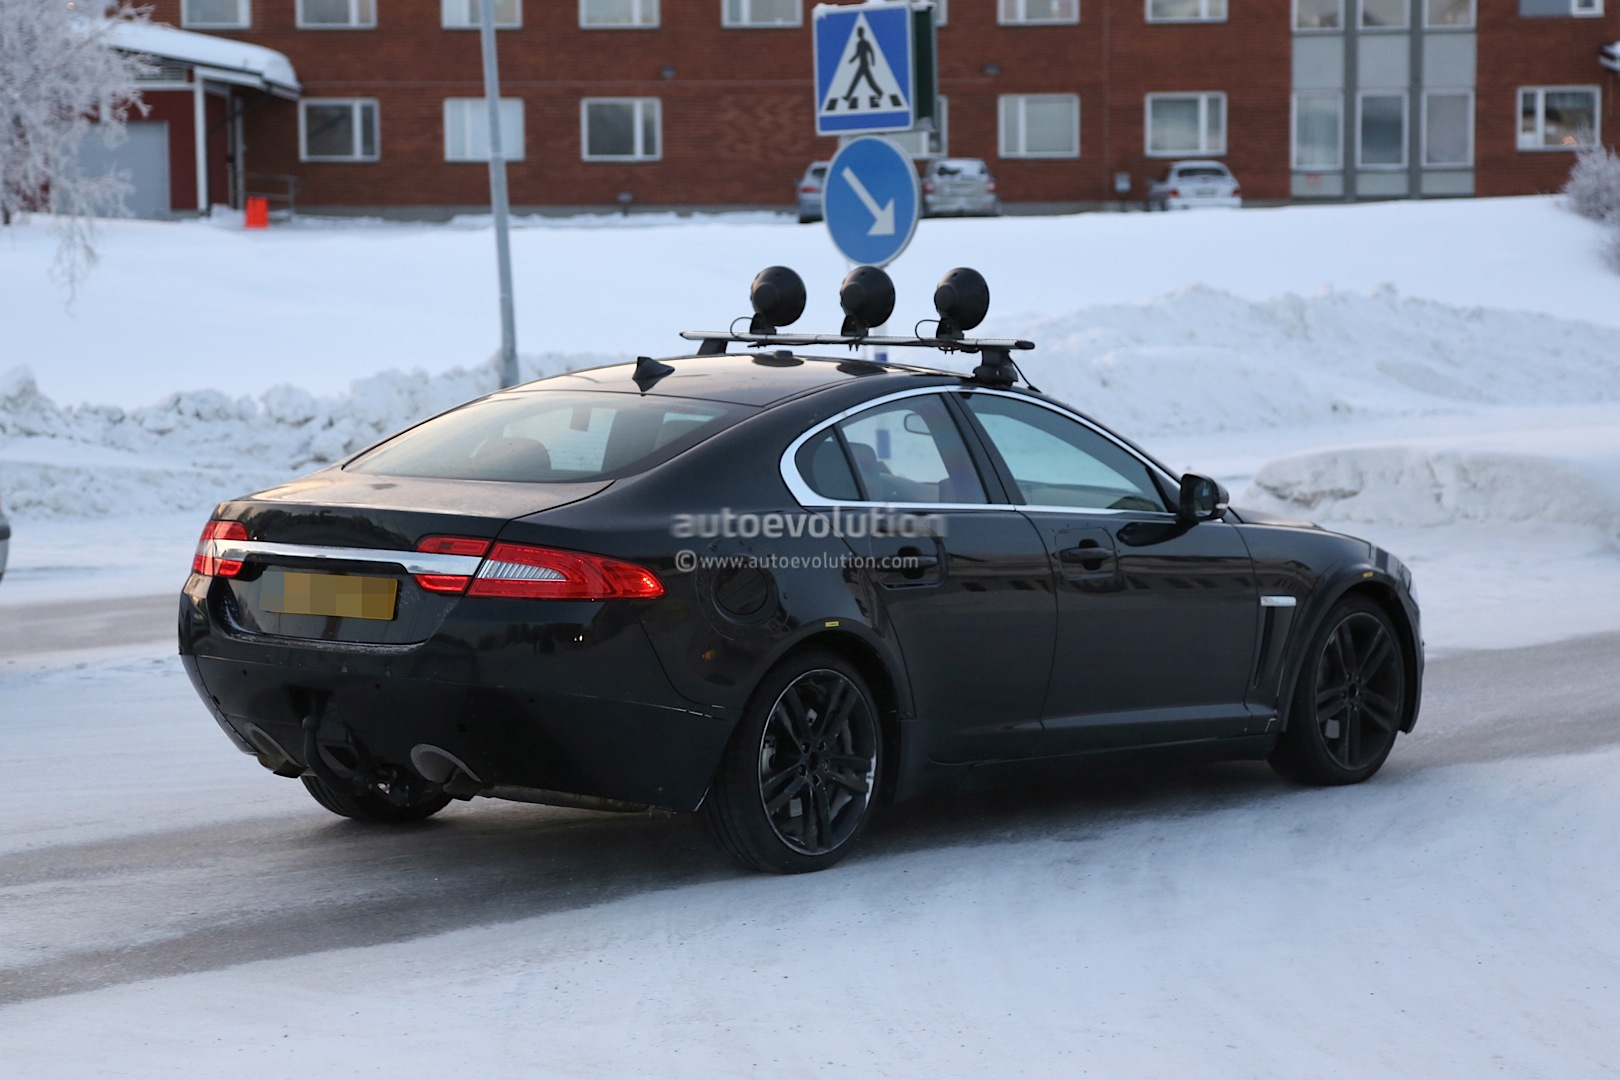 Spyshots: Jaguar XS Test Mule Winter Testing in Sweden - autoevolution